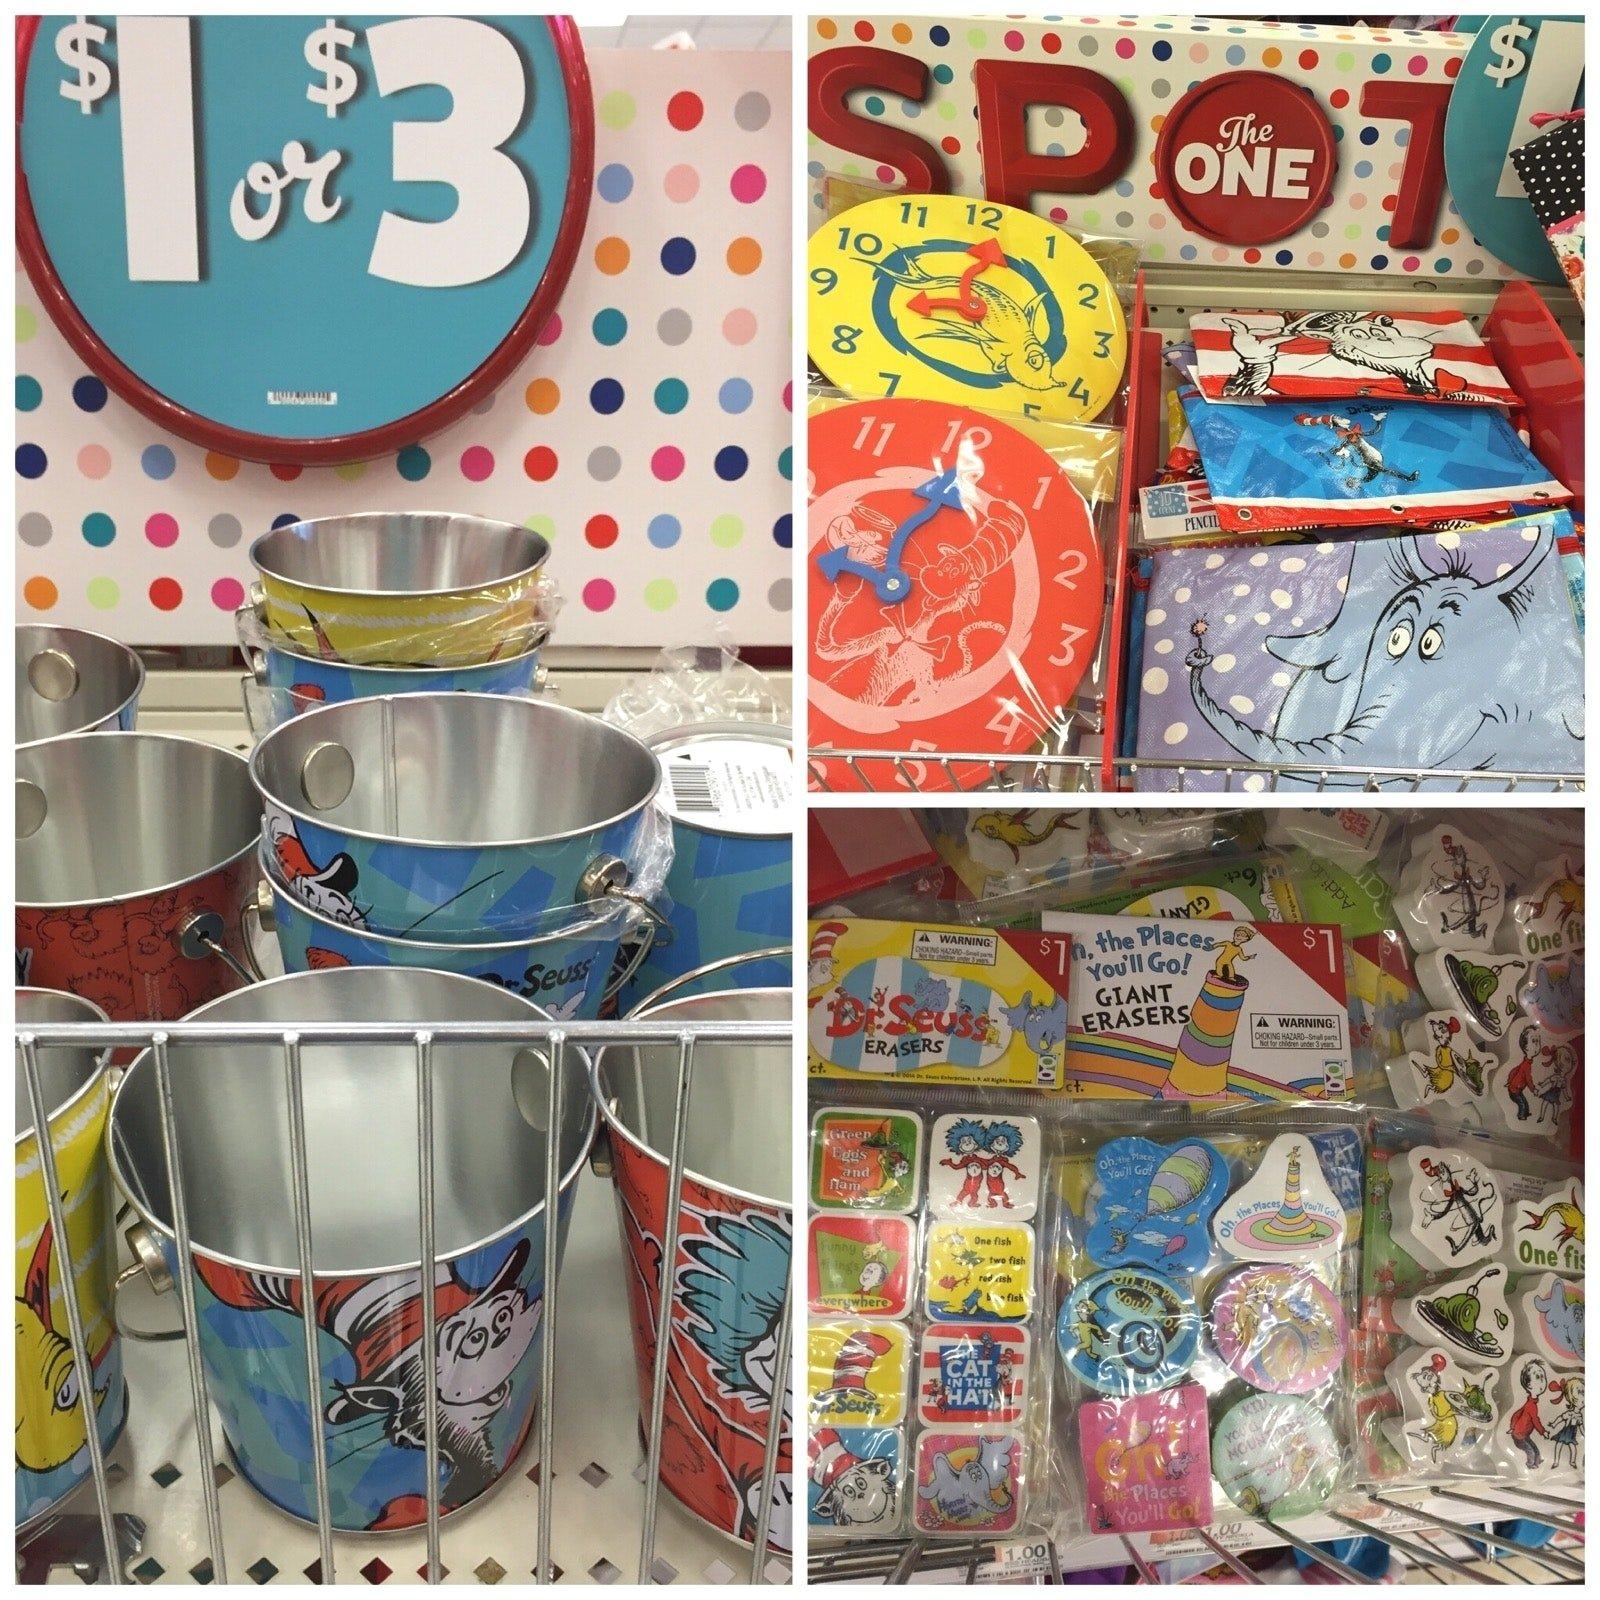 10 Attractive Dr Seuss Classroom Decorating Ideas dr seuss classroom decorations best decorating ideas interior design 2020